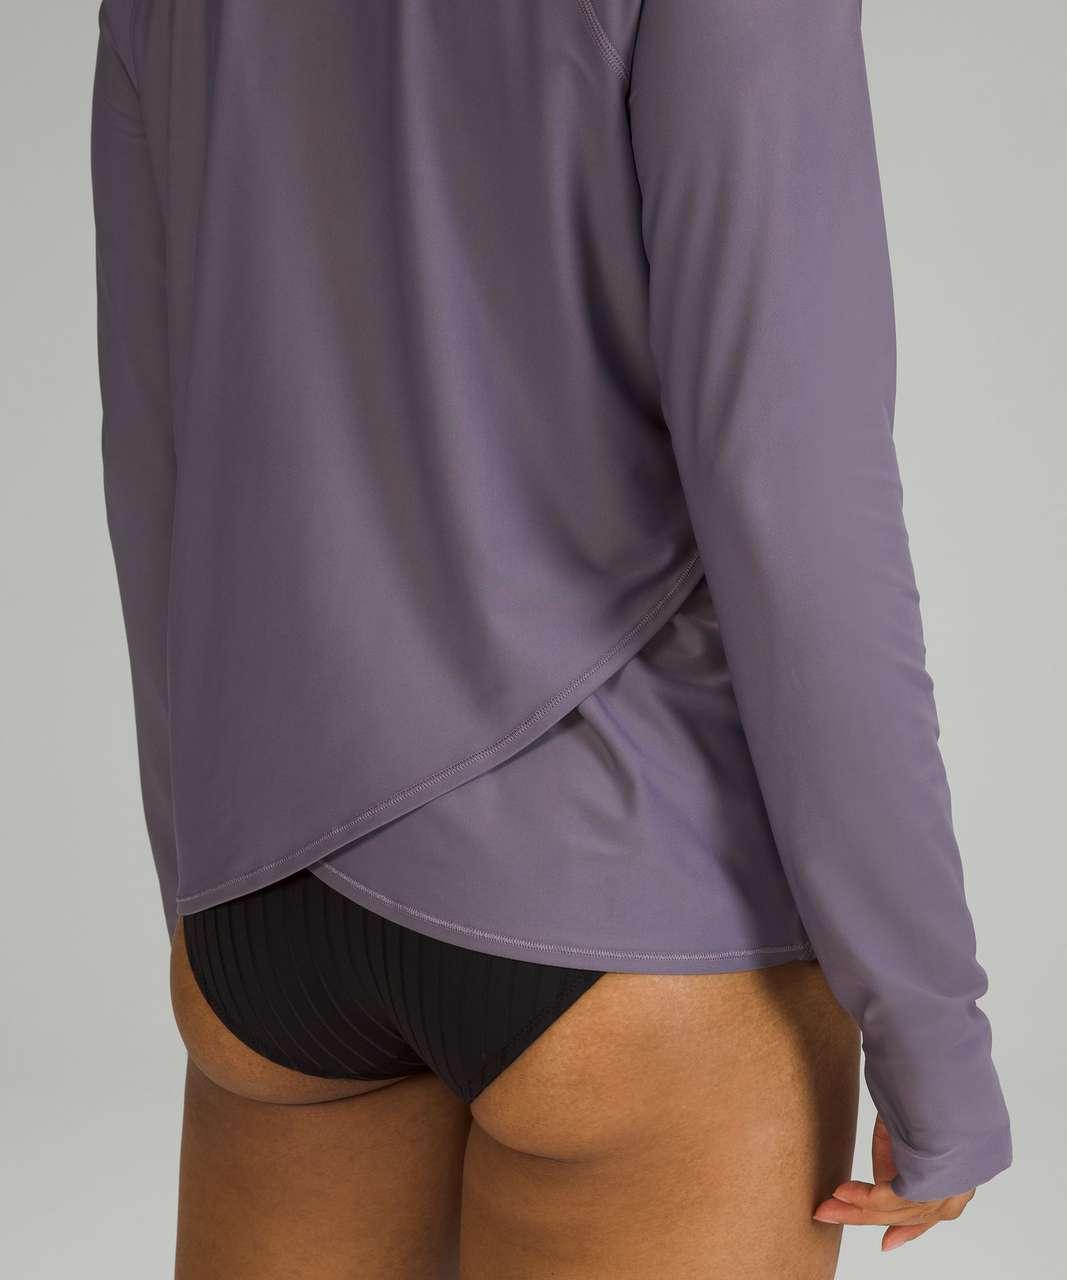 Lululemon Waterside Relaxed UV Protection Long Sleeve - Dusky Lavender